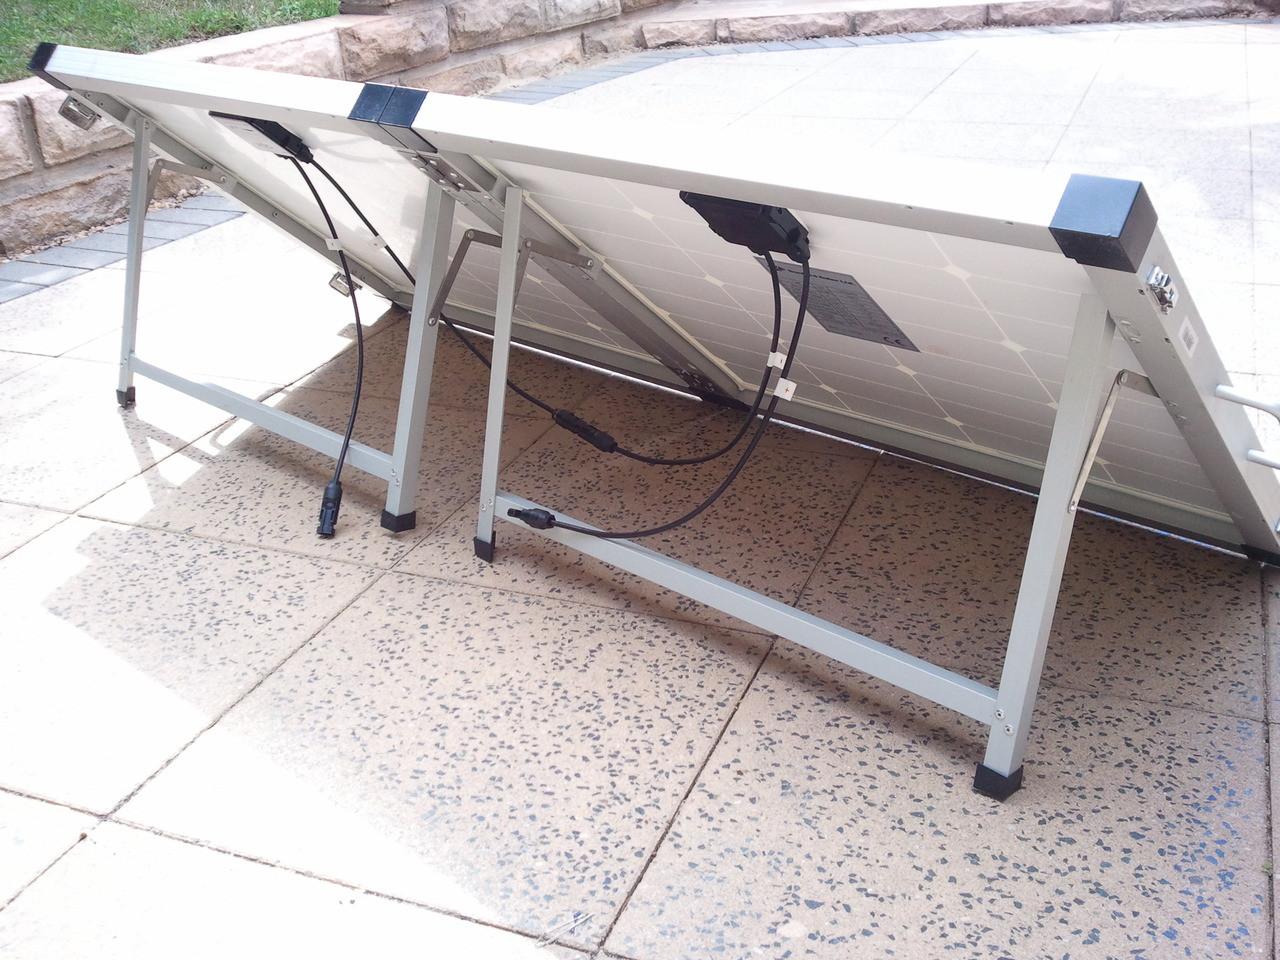 120 Watt Foldable Solar Panel - DEMO - USED